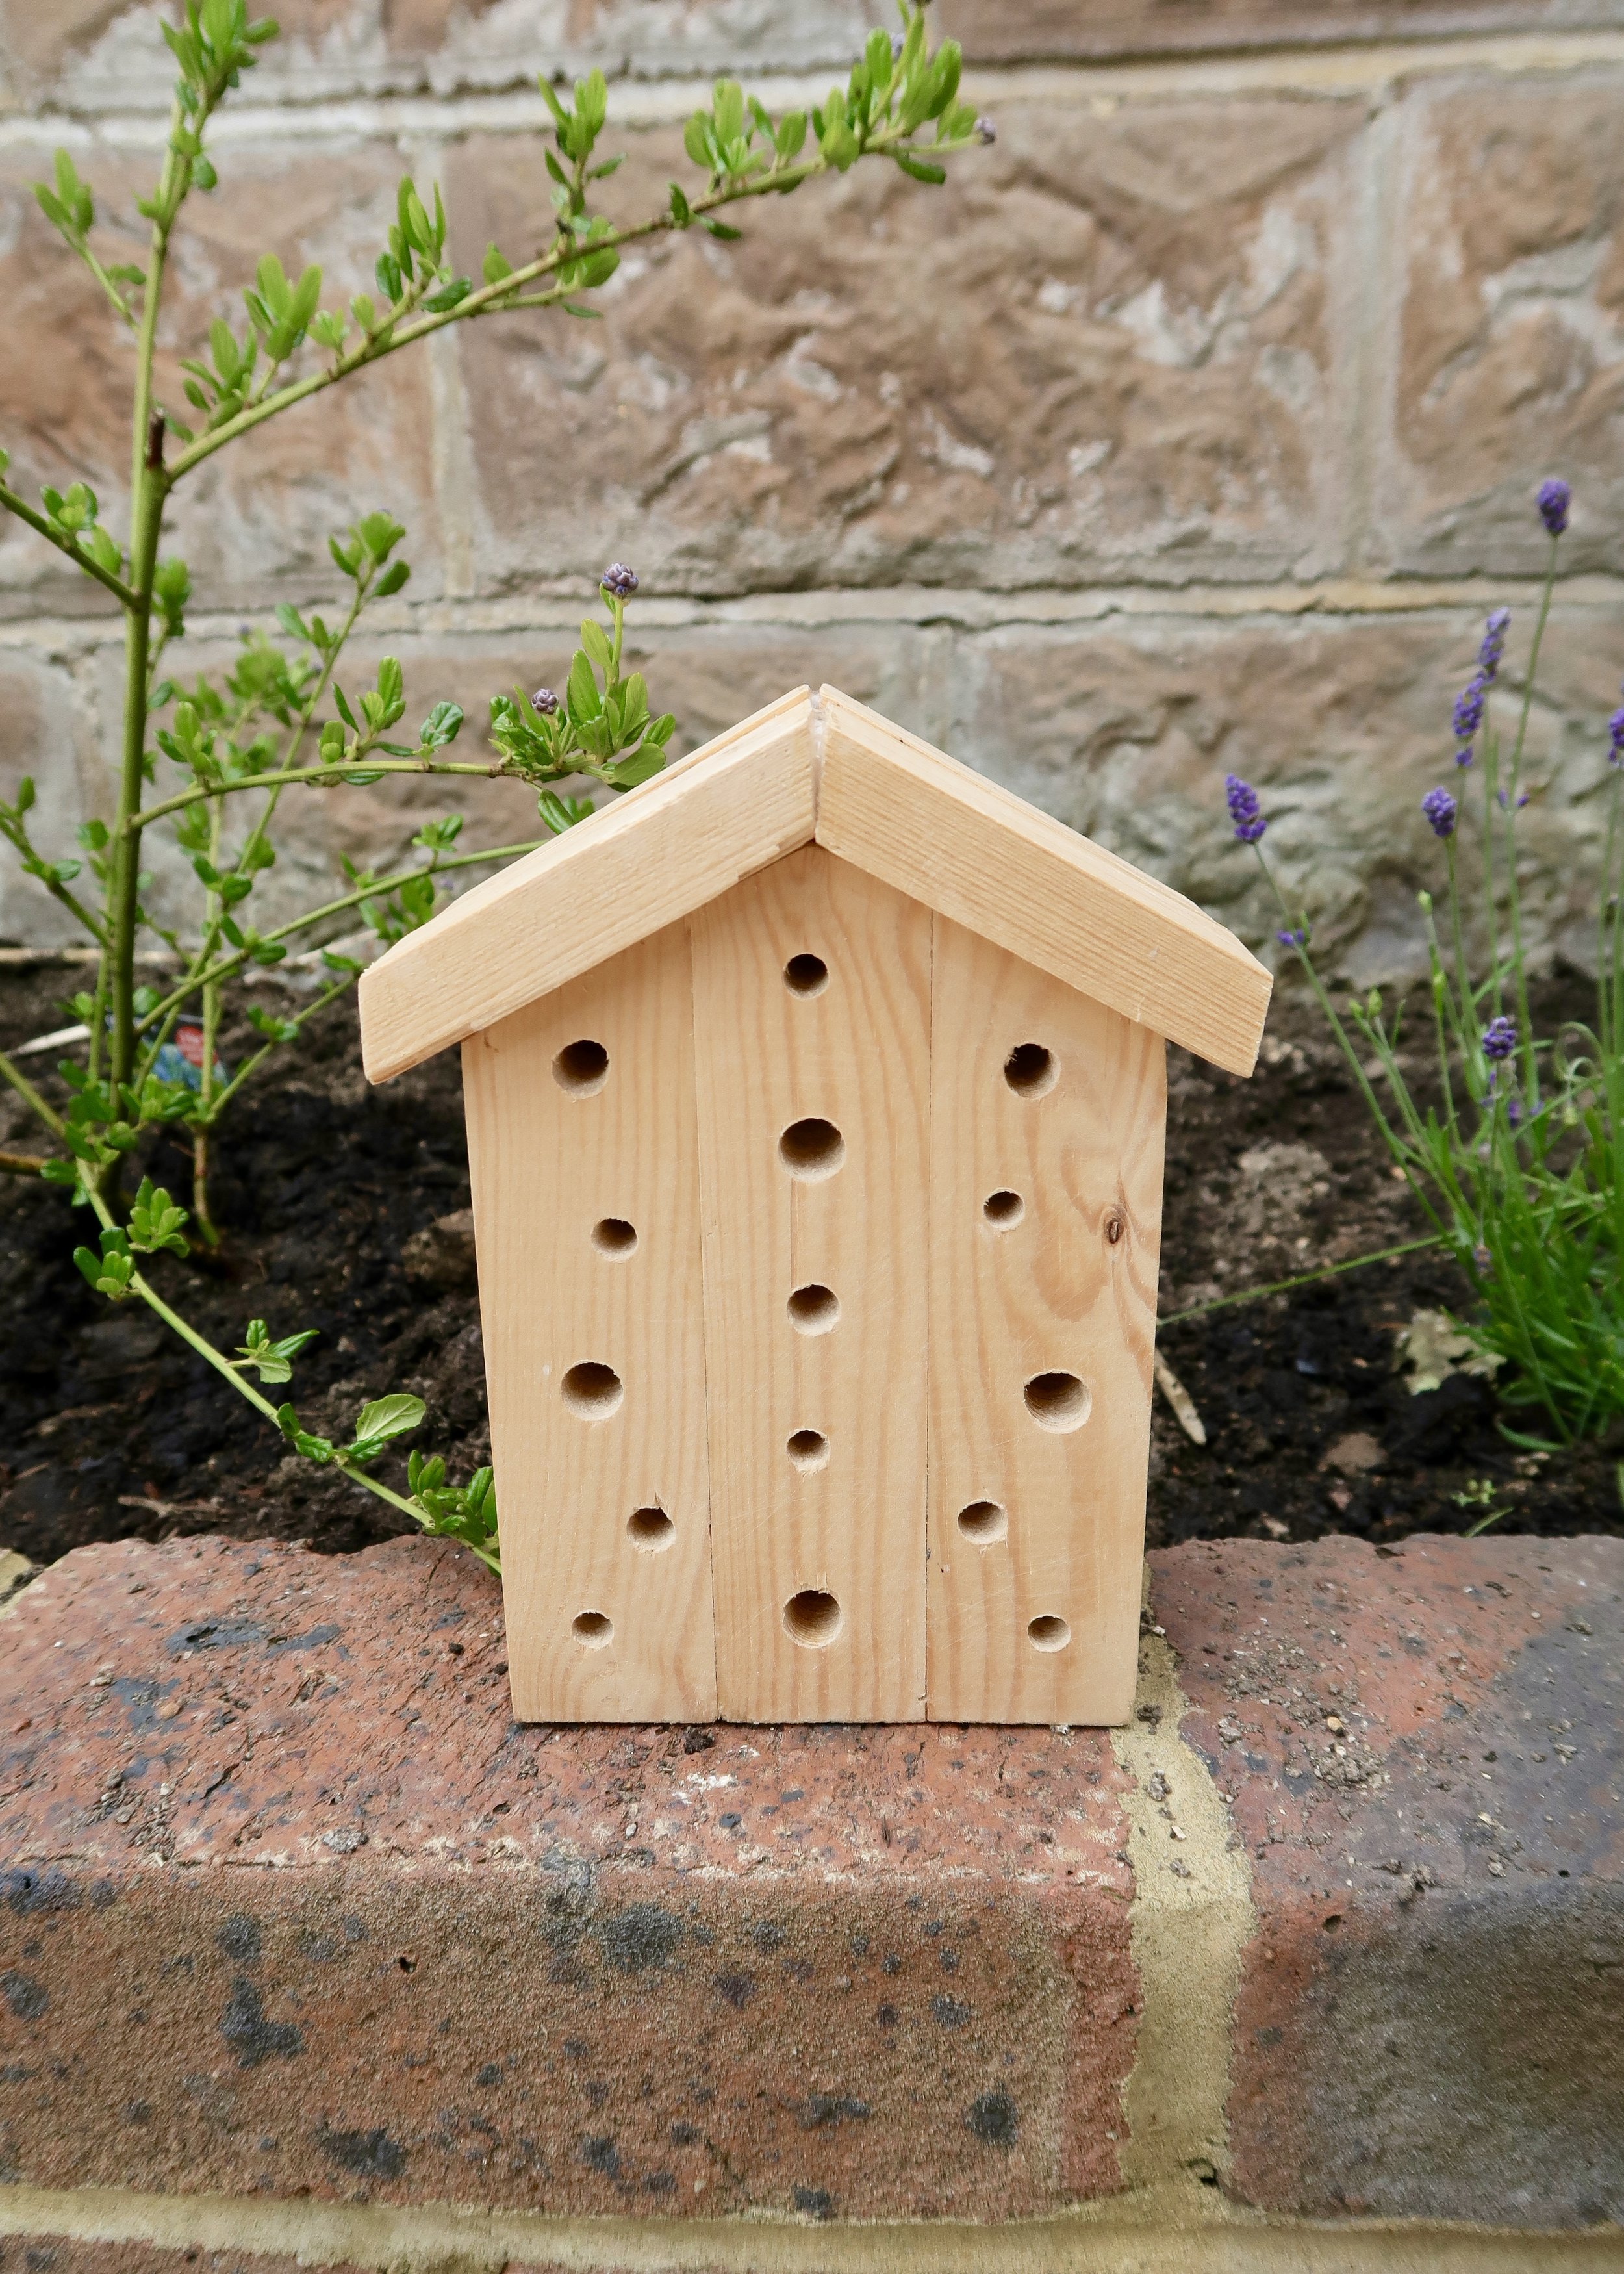 DIY Wooden Bee Hotel by Isoscella